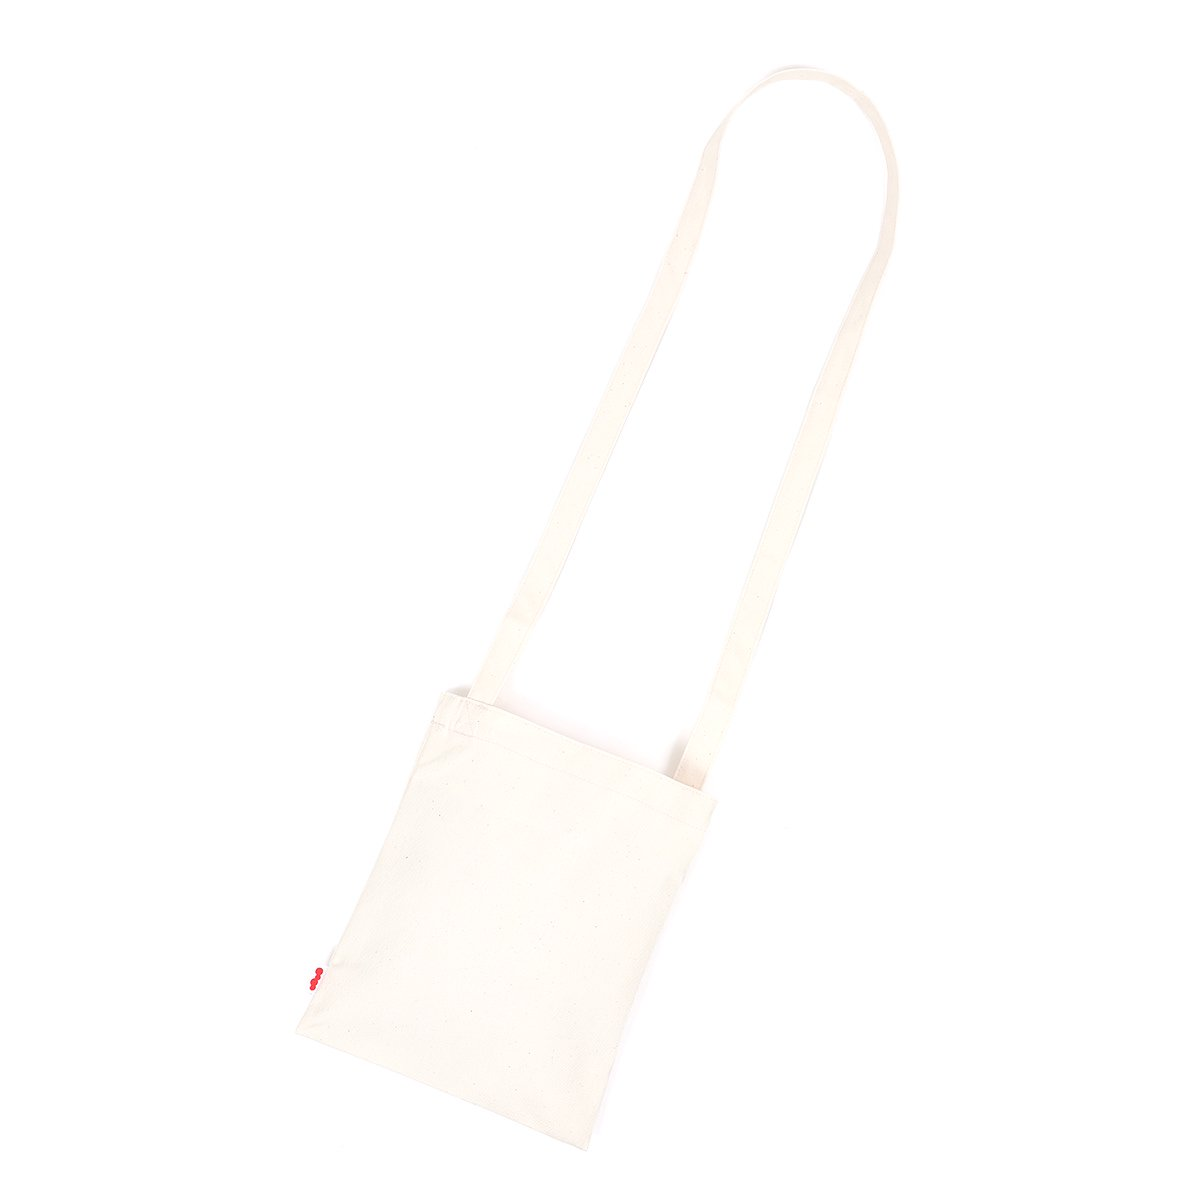 Cotton HF Sacoche(孫・ジィジ&バァバシリーズ) 詳細画像11